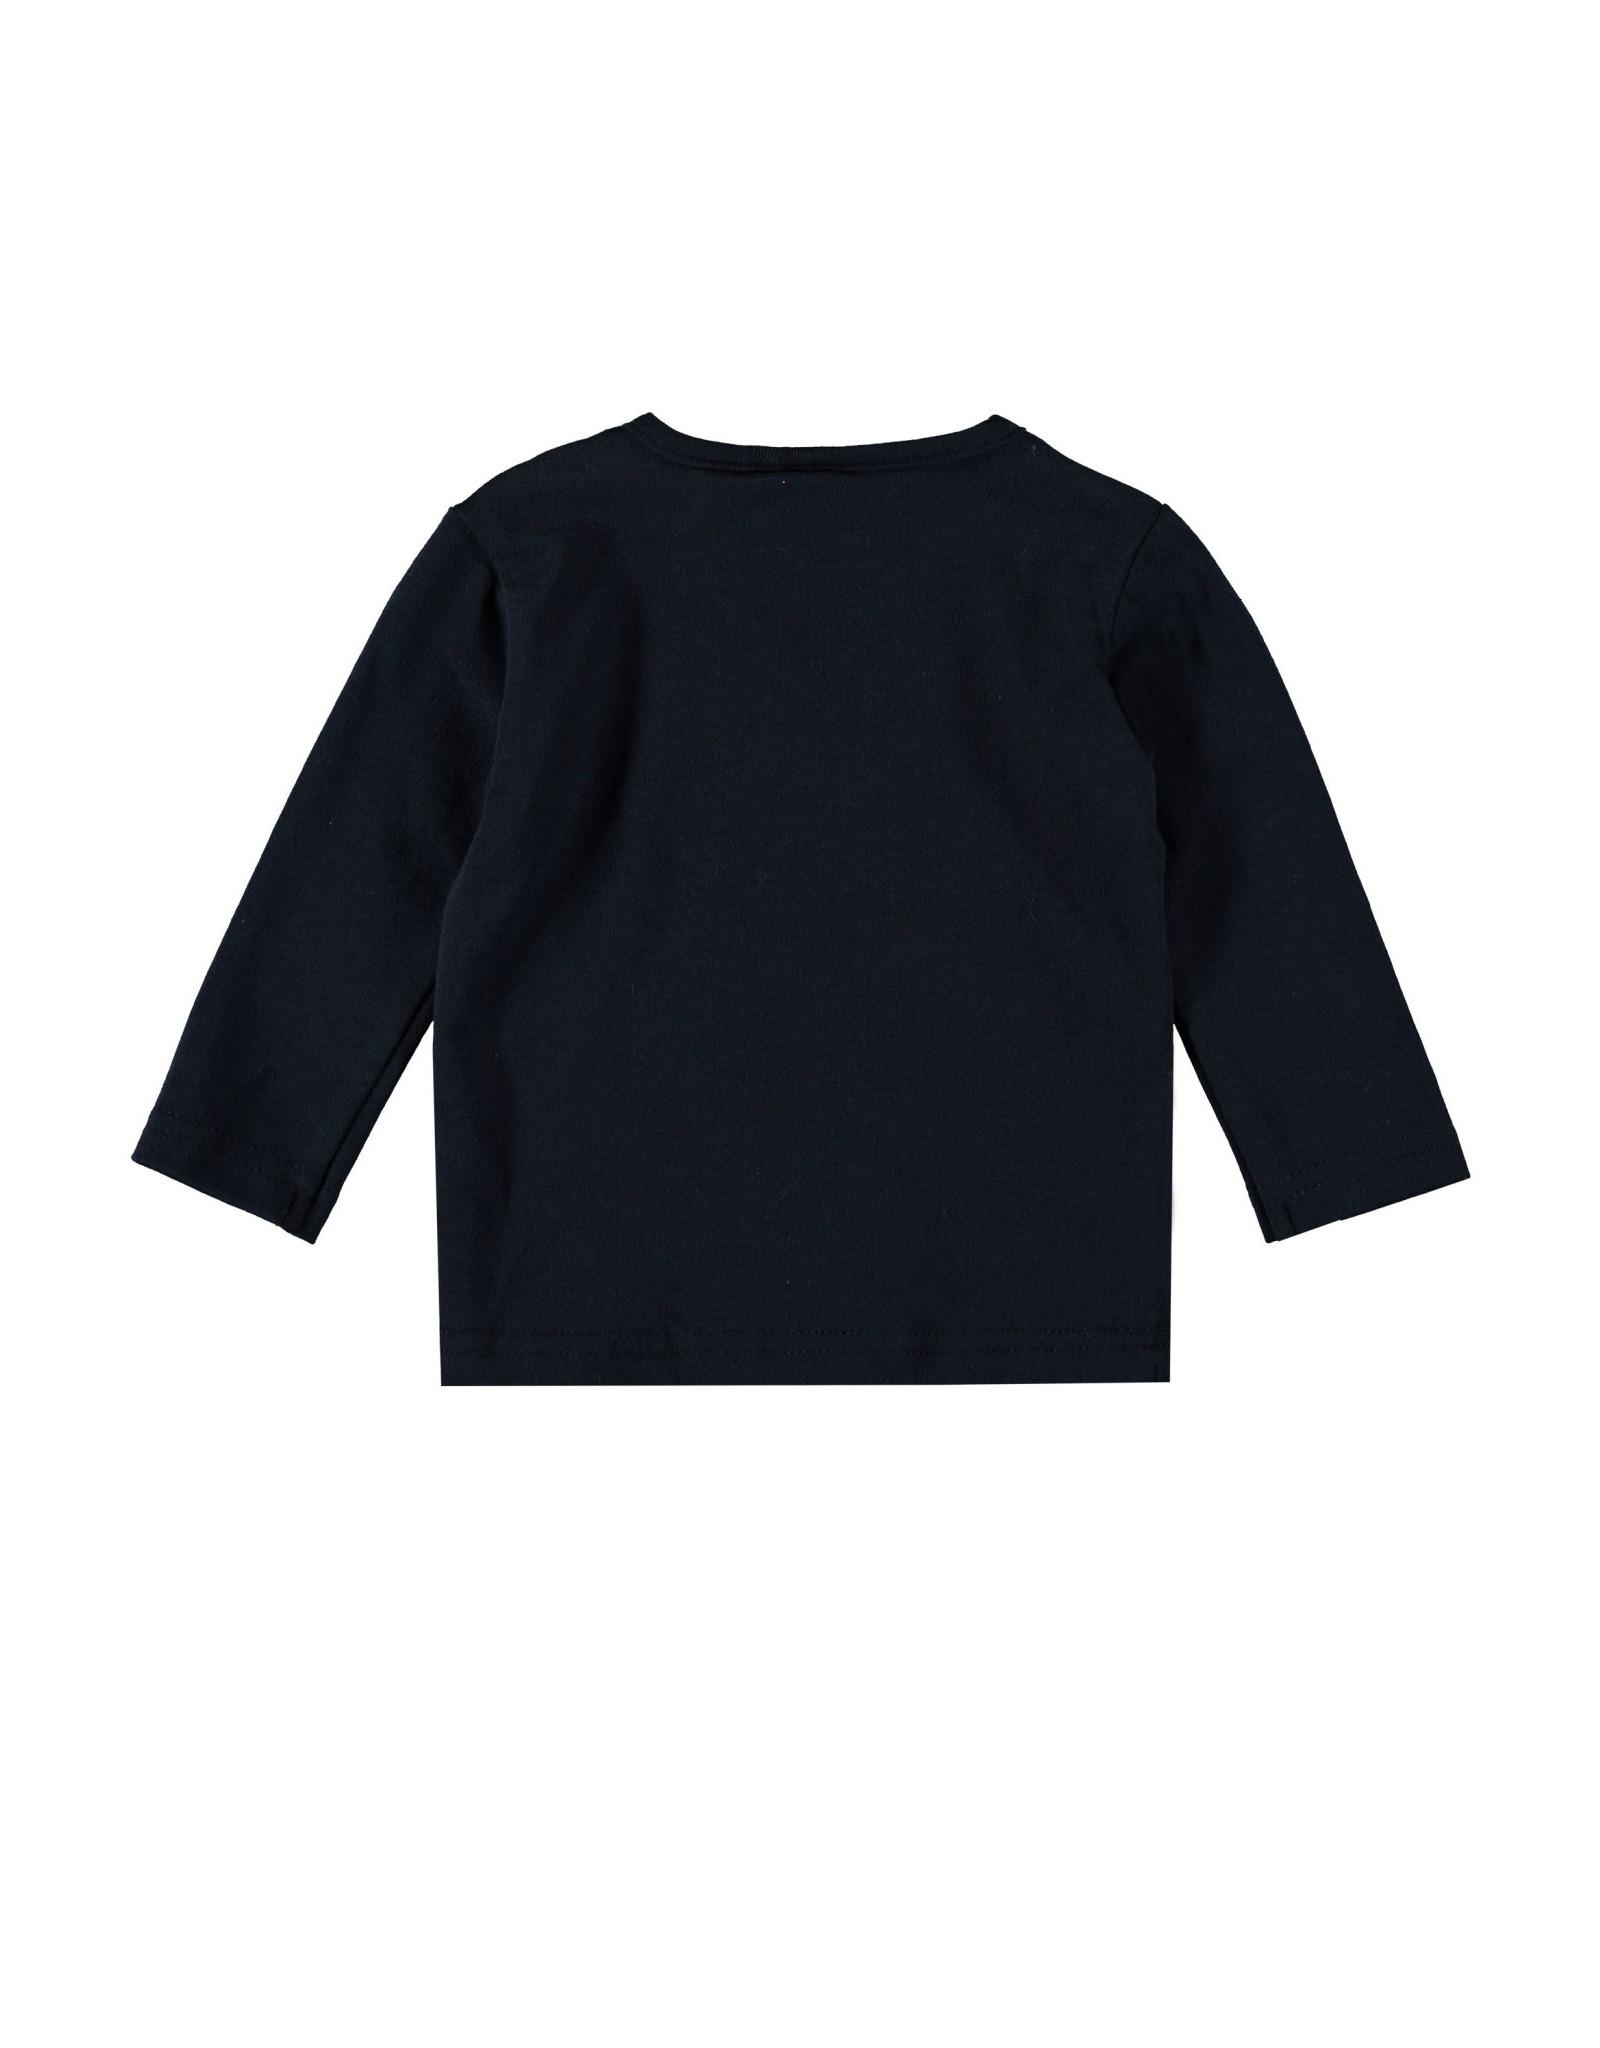 Bampidano Bampidano New Born baby jongens shirt Avery Clouds Navy